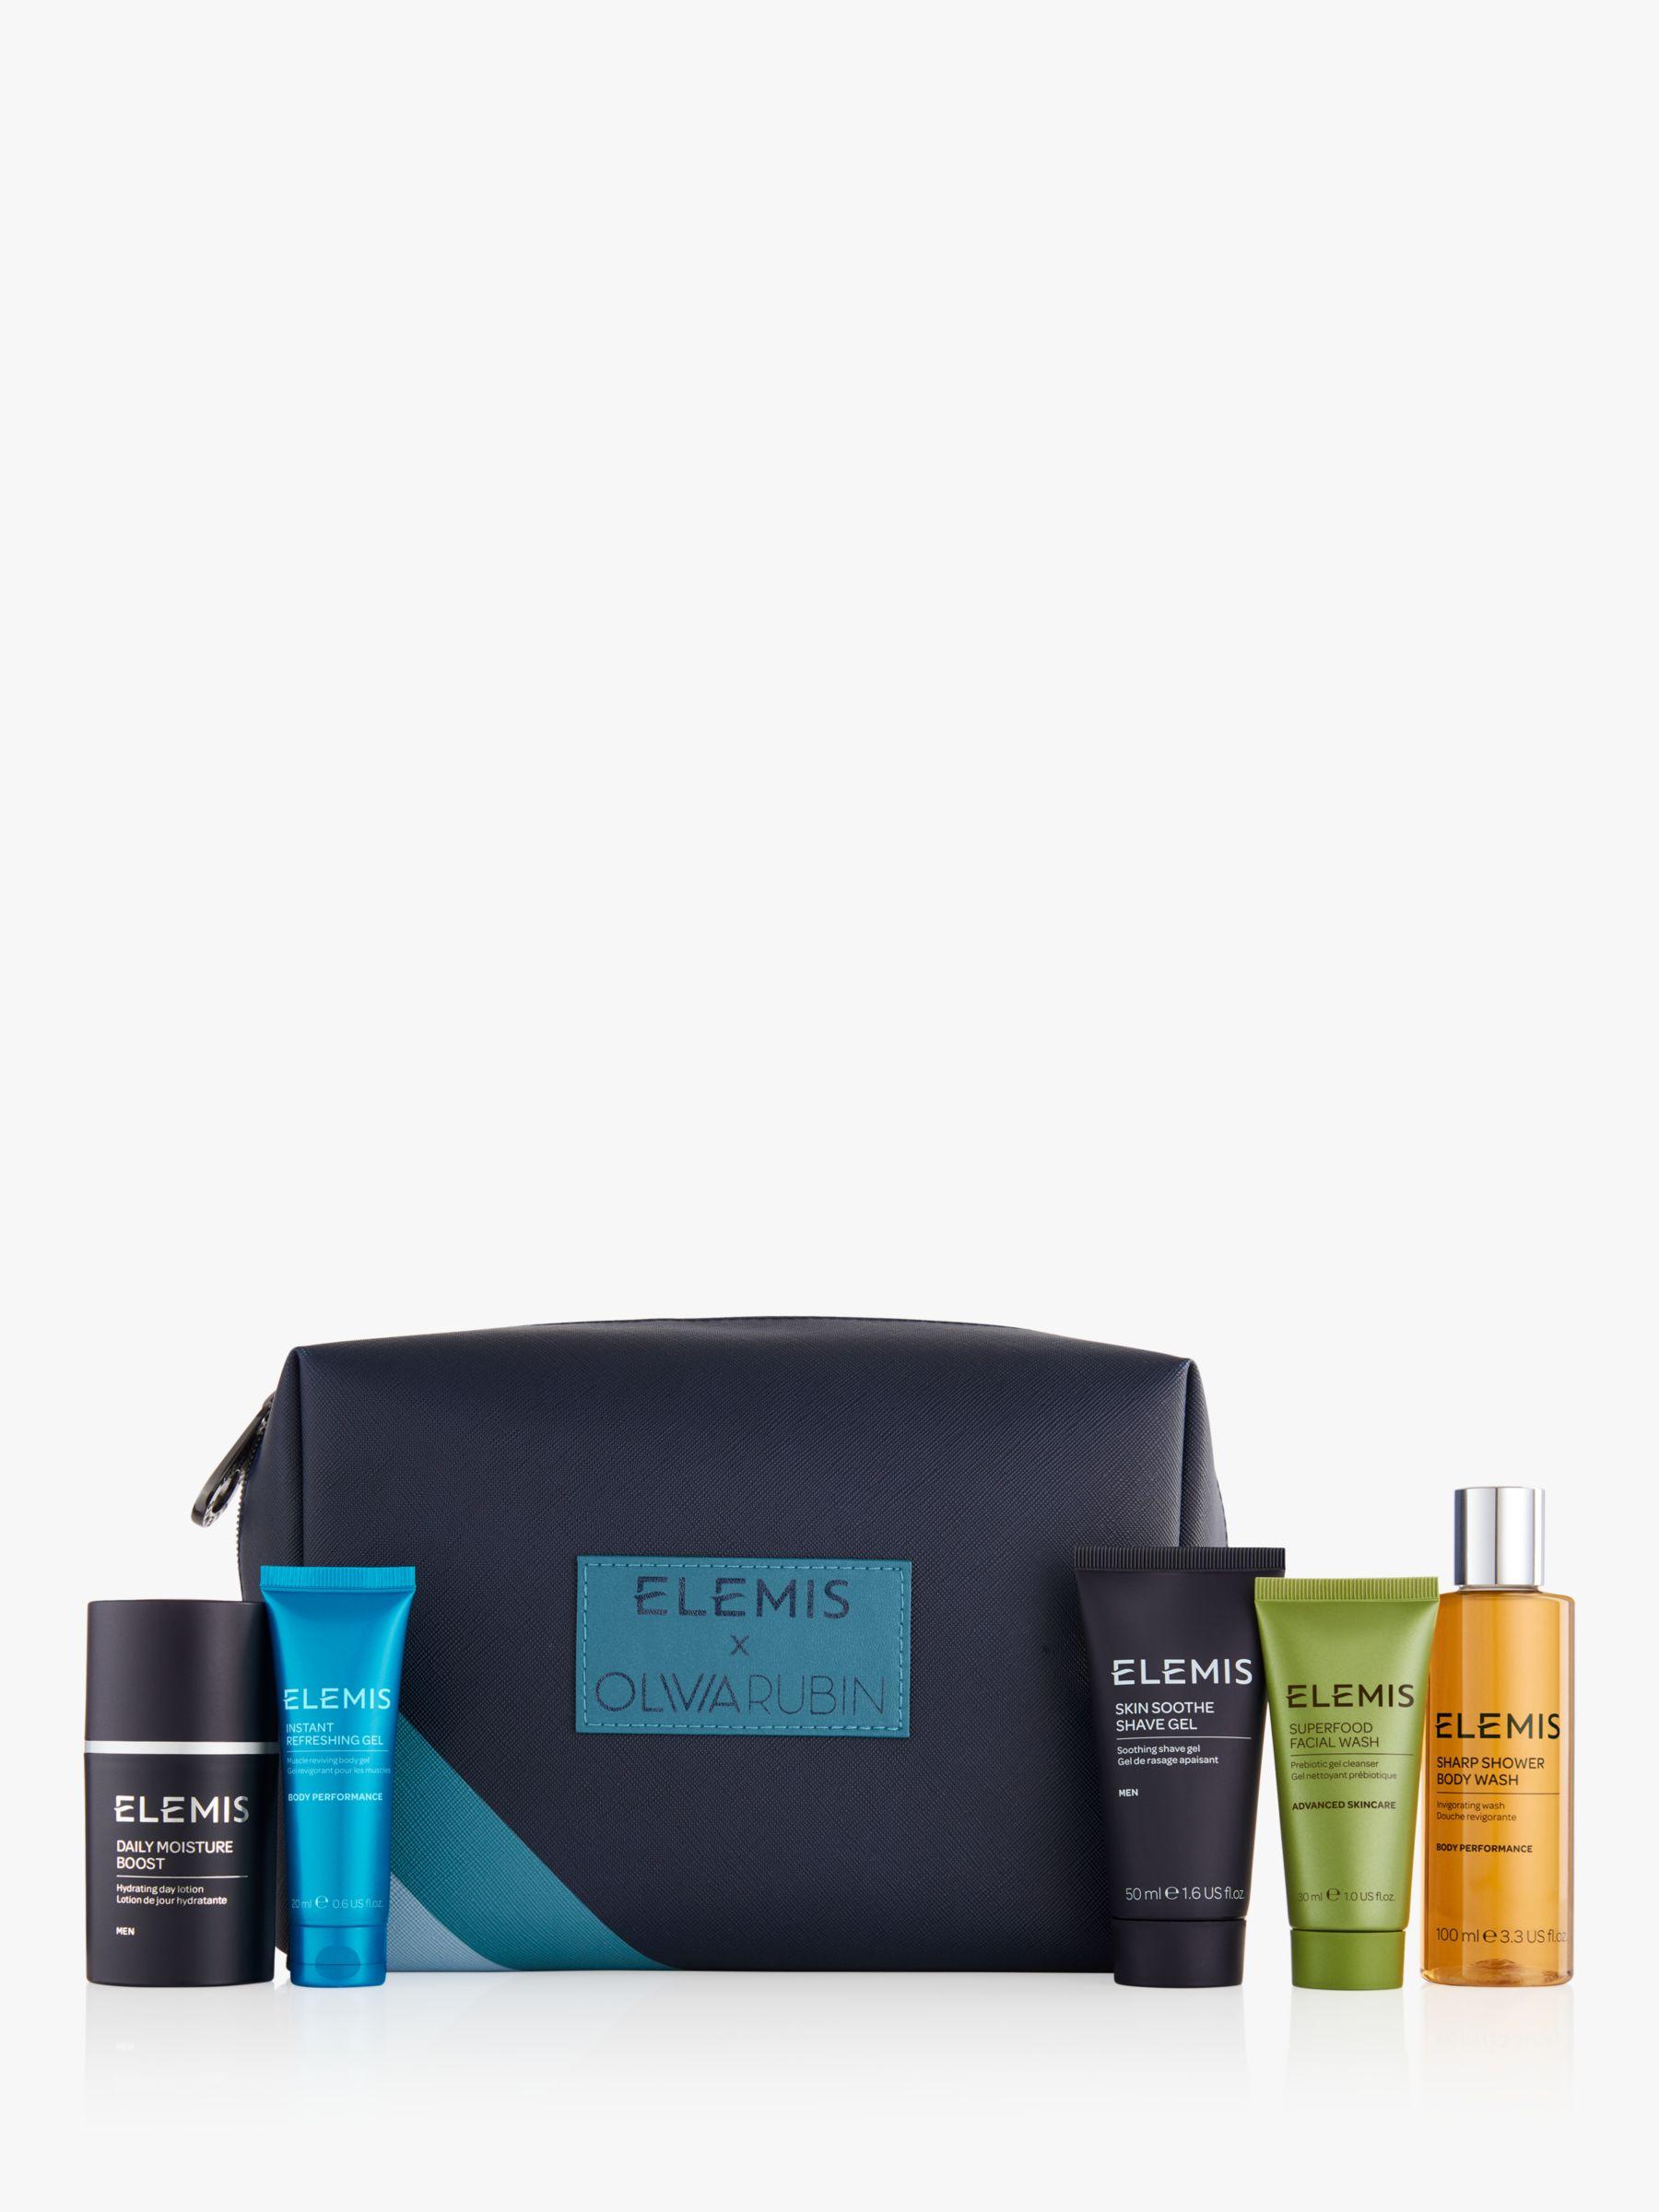 Elemis X Olivia Rubin Luxury Traveller For Him Skincare Gift Set At John Lewis Partners